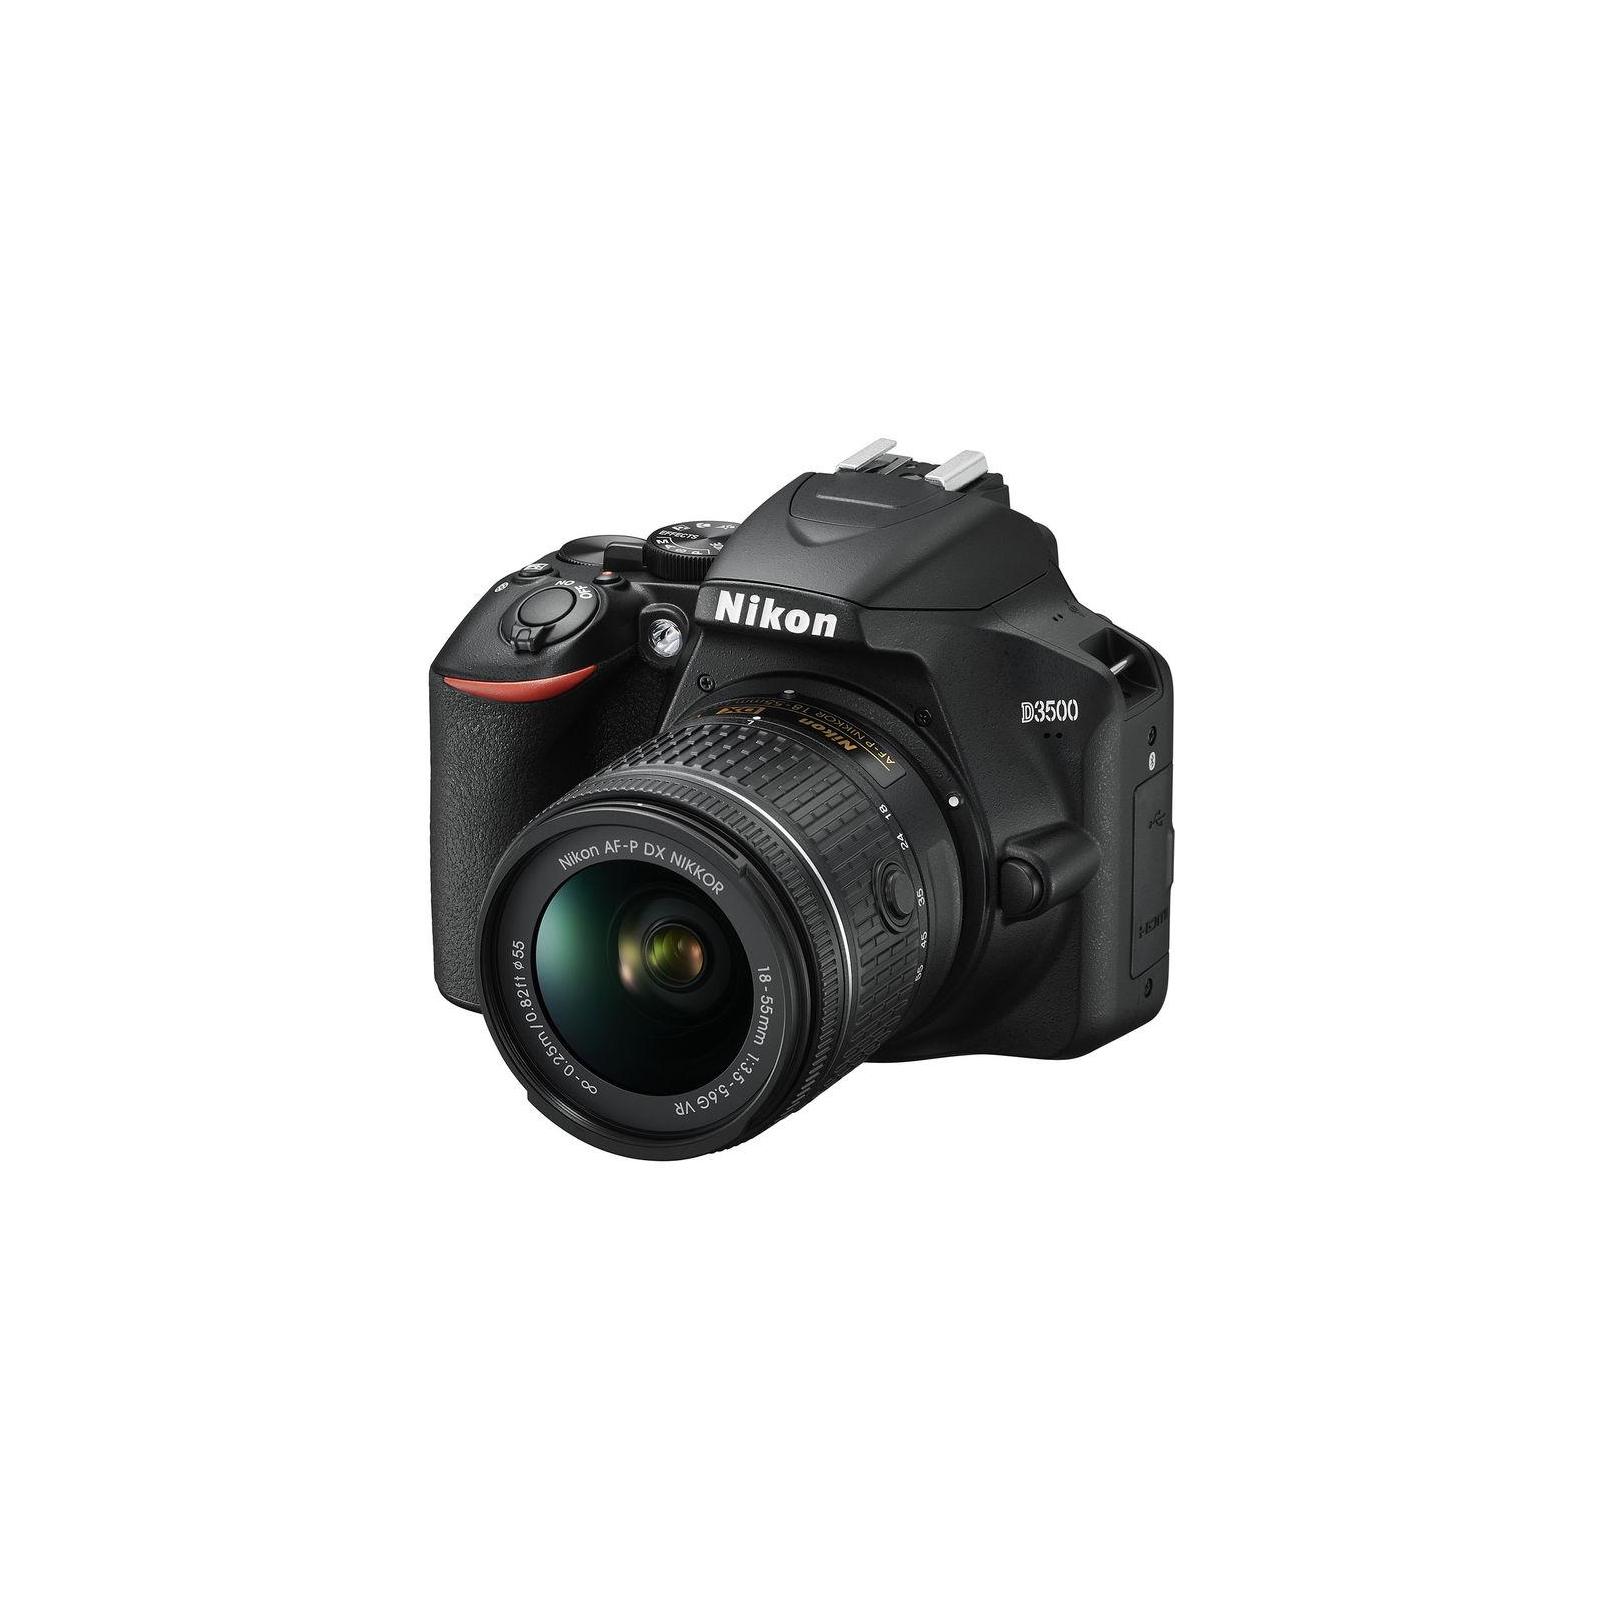 Цифровой фотоаппарат Nikon D3500 AF-P 18-55 non-VR kit (VBA550K002)